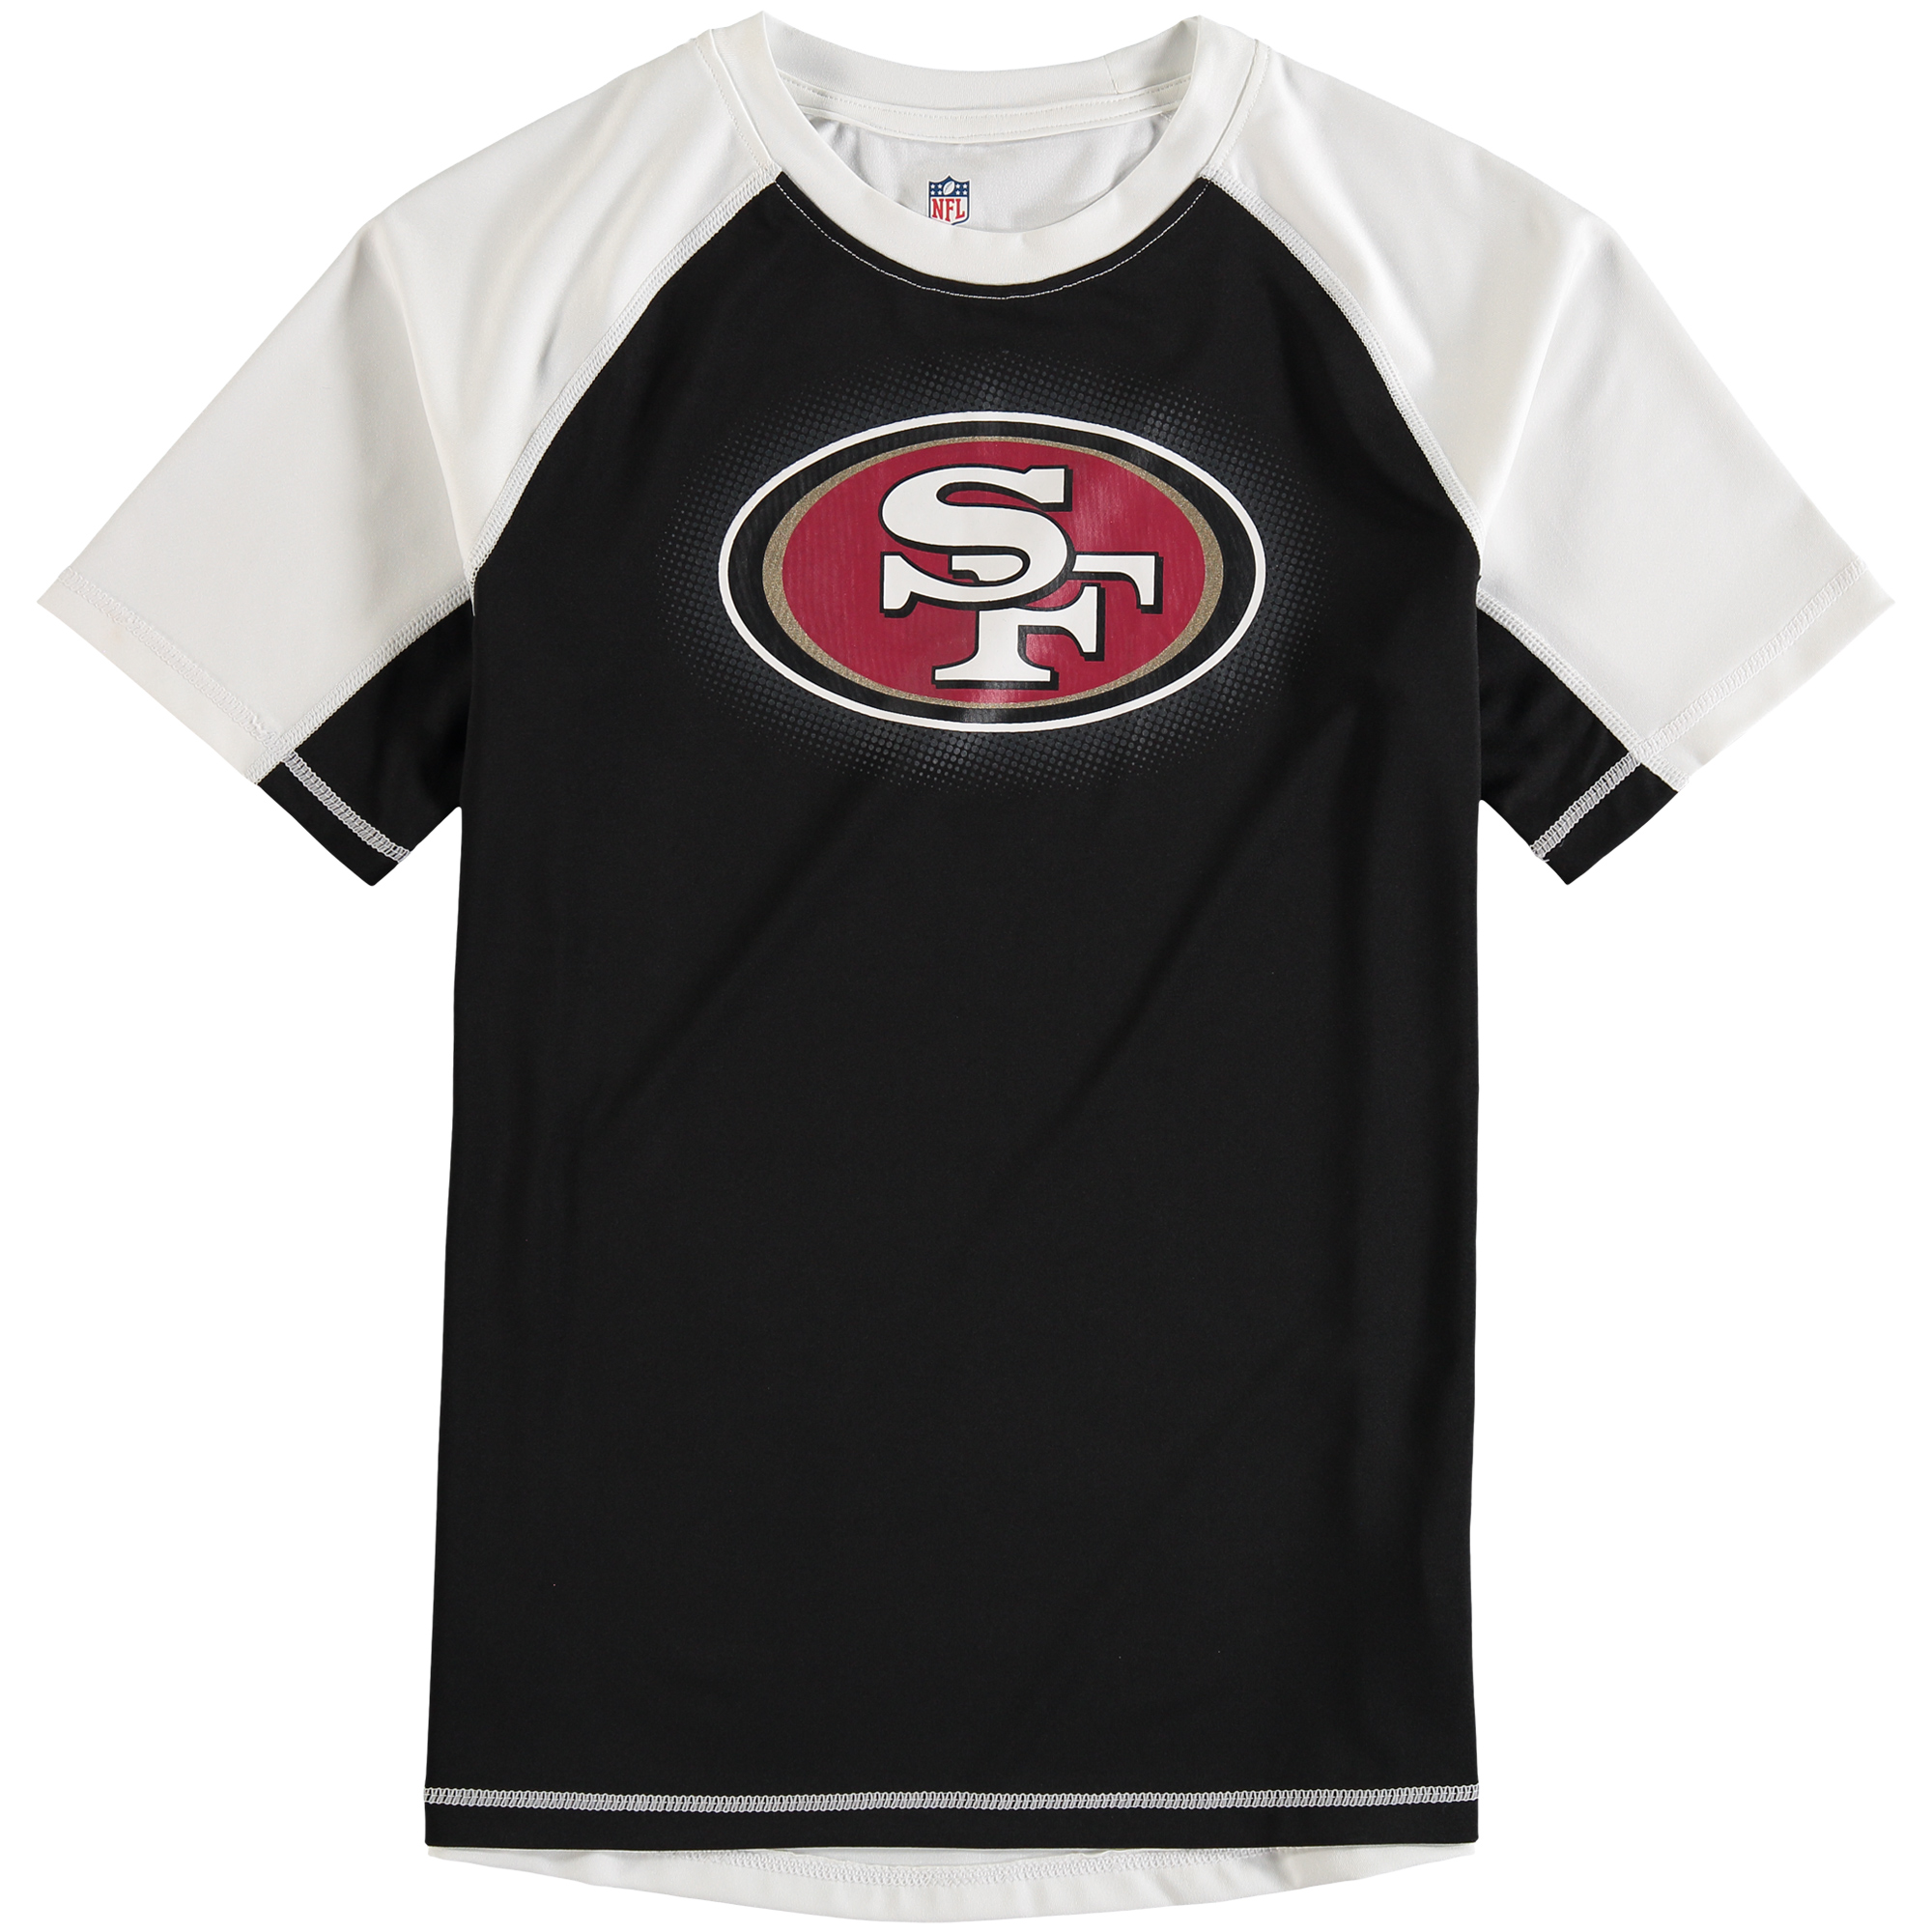 San Francisco 49ers Youth Color Block Rash Guard T-Shirt - Black/White